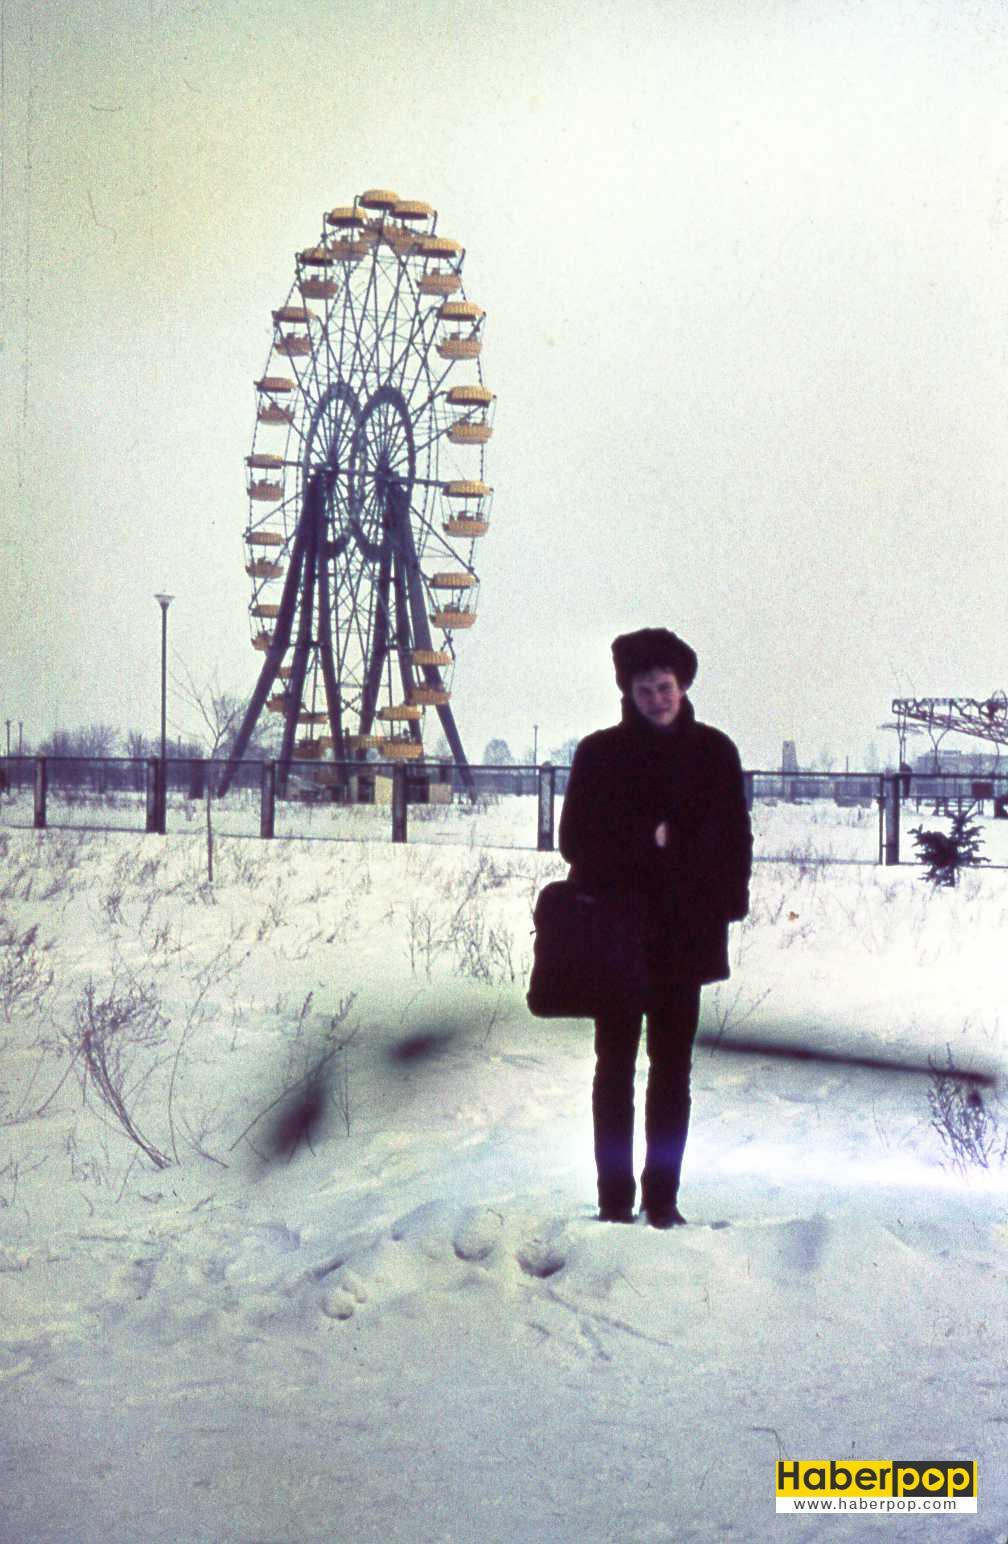 cernobil-nukleer-felaketi-pripyat-haberpop-lunapark2